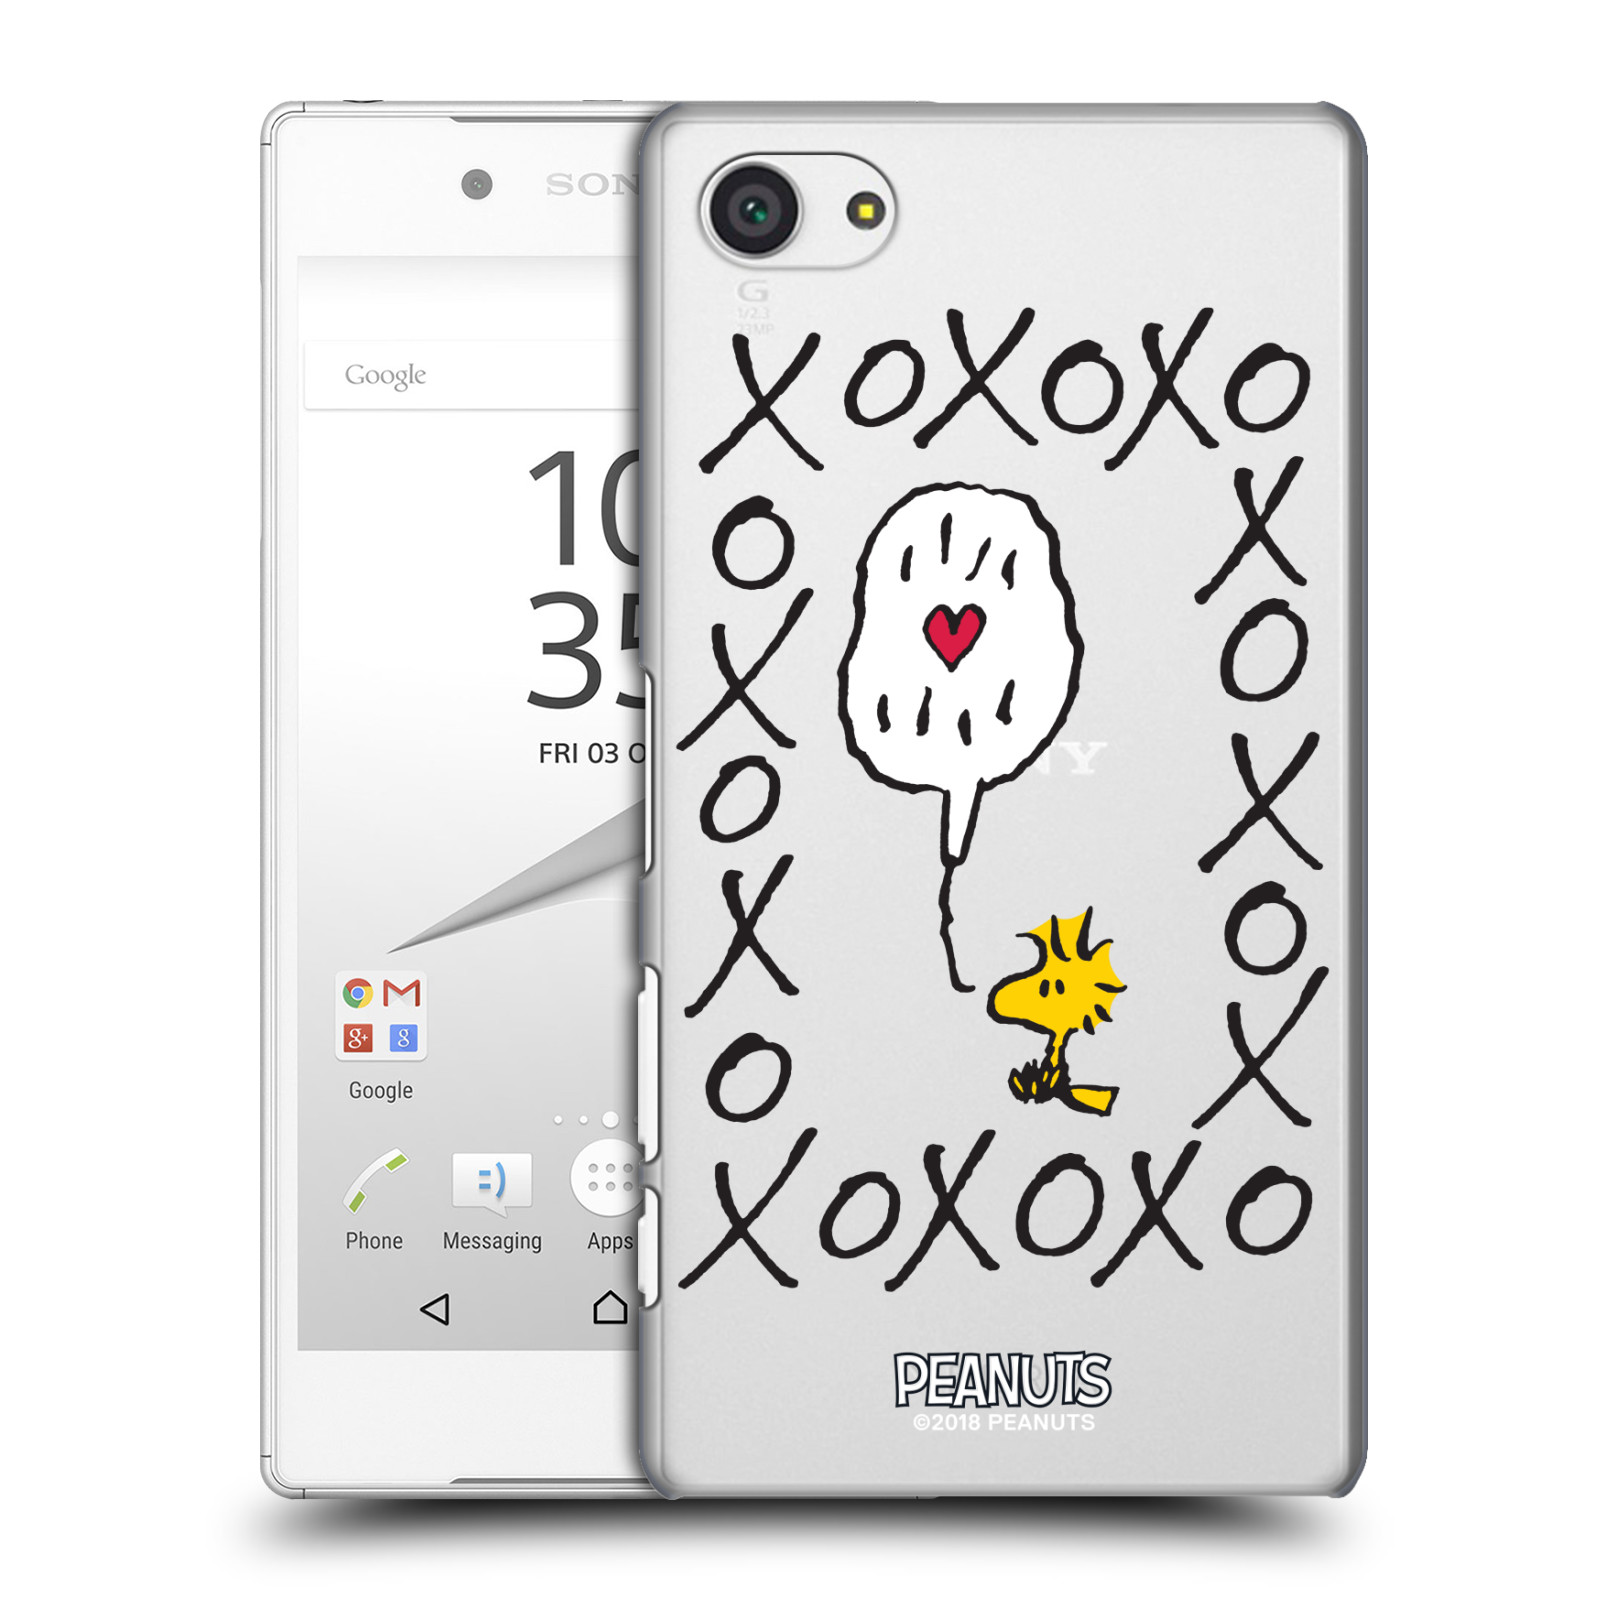 Pouzdro na mobil Sony Xperia Z5 COMPACT Oficiální motiv Peanuts ptáček Woodstock srdíčko